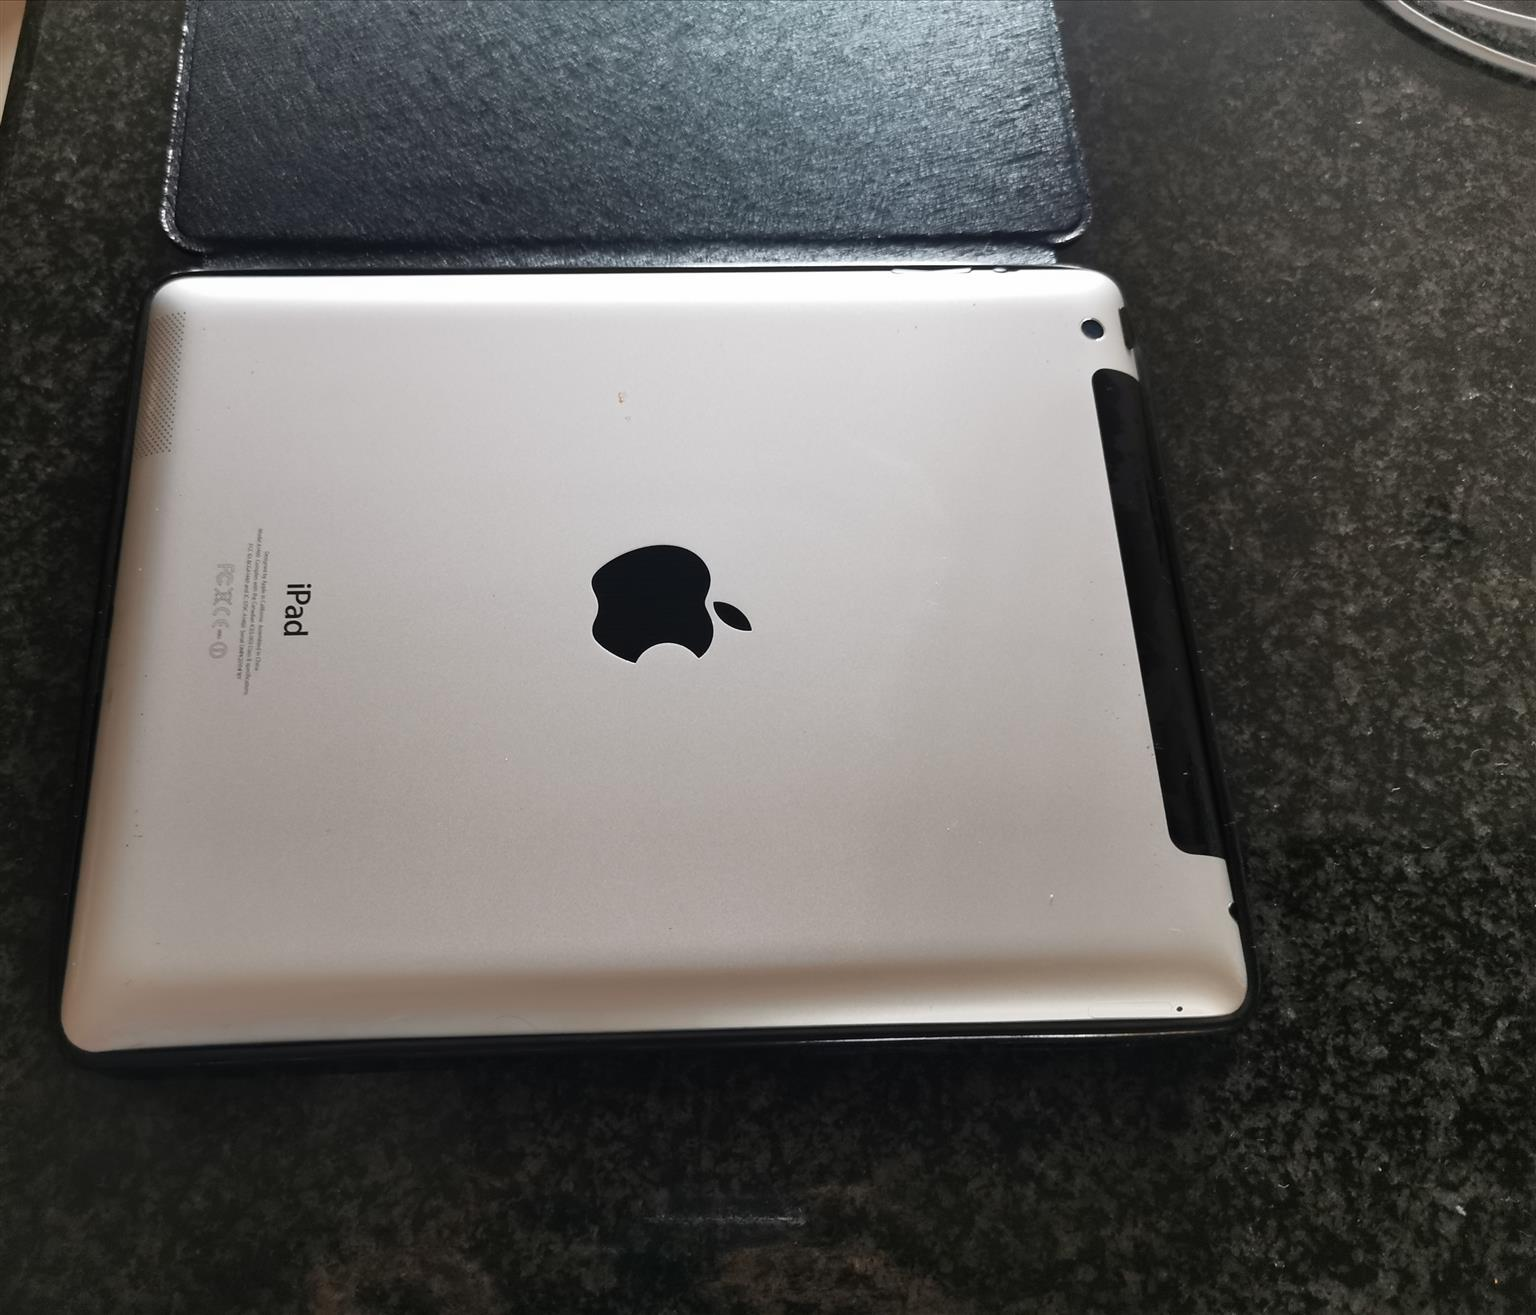 Apple Ipad Generation 4 - 64GB